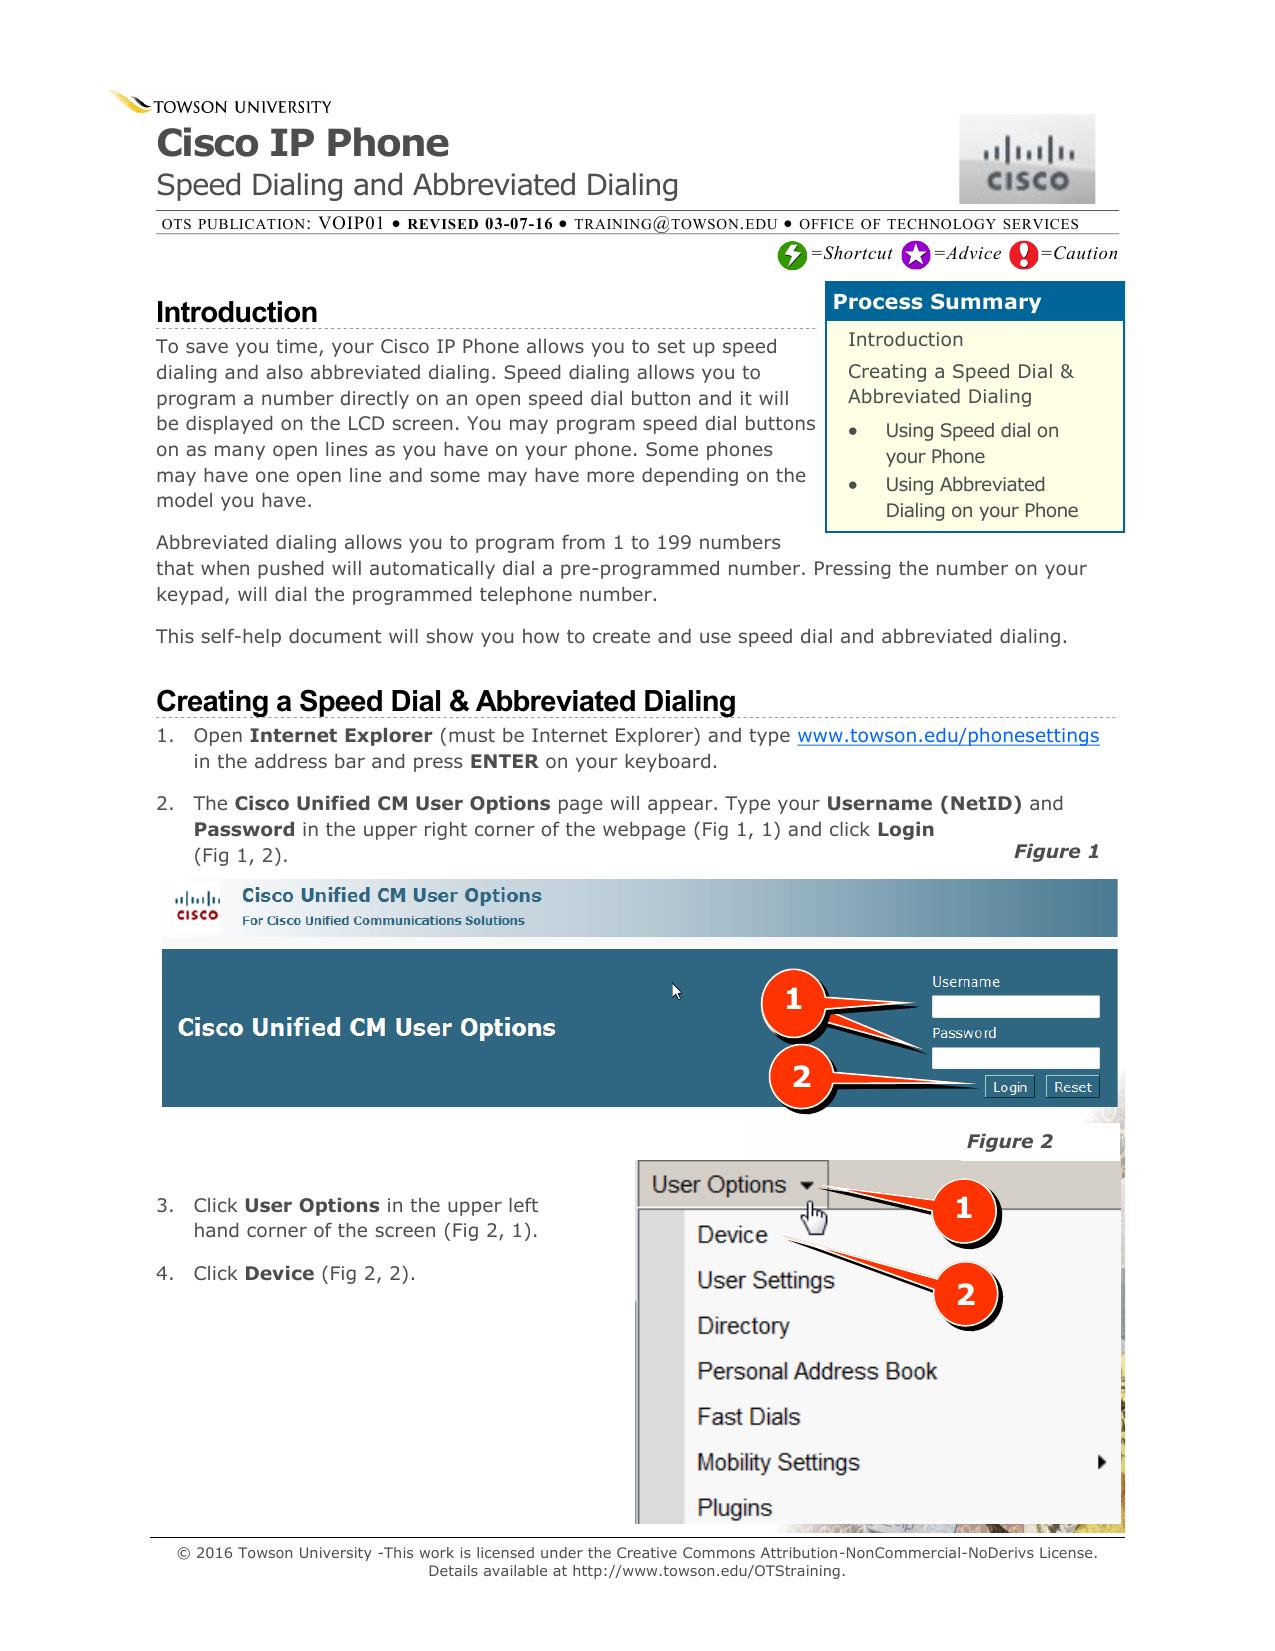 Cisco IP Phone: Speed Dialing and Abbreviated | manualzz com